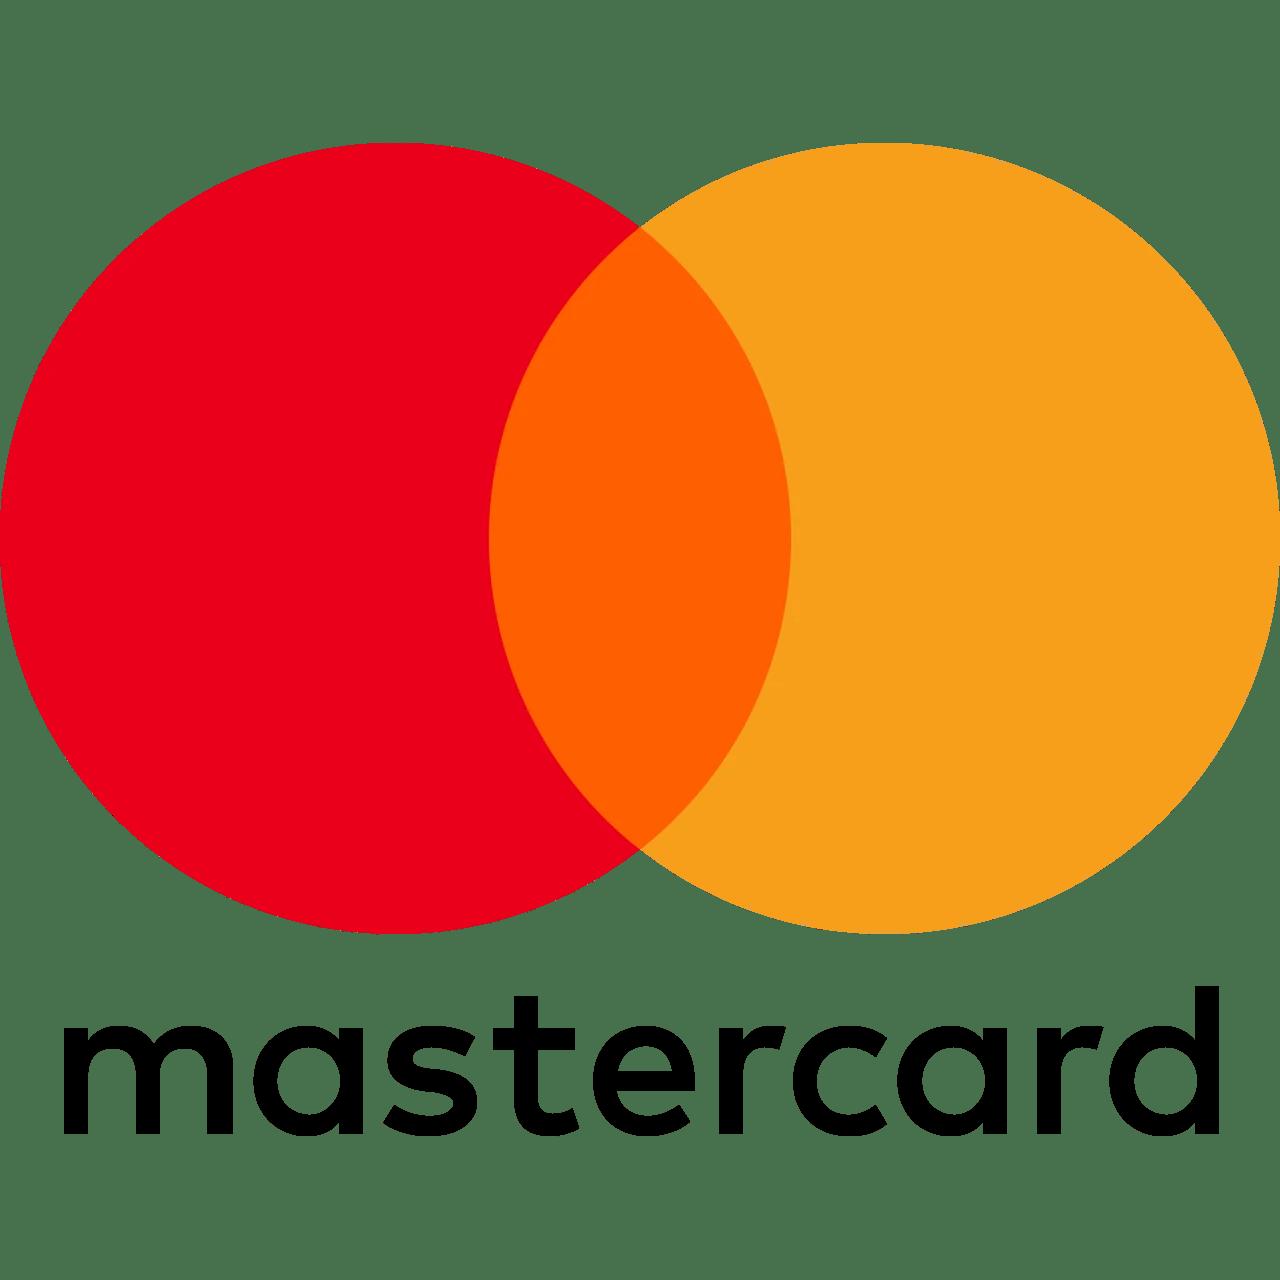 Mastercard | Fundamentale Aktienanalyse